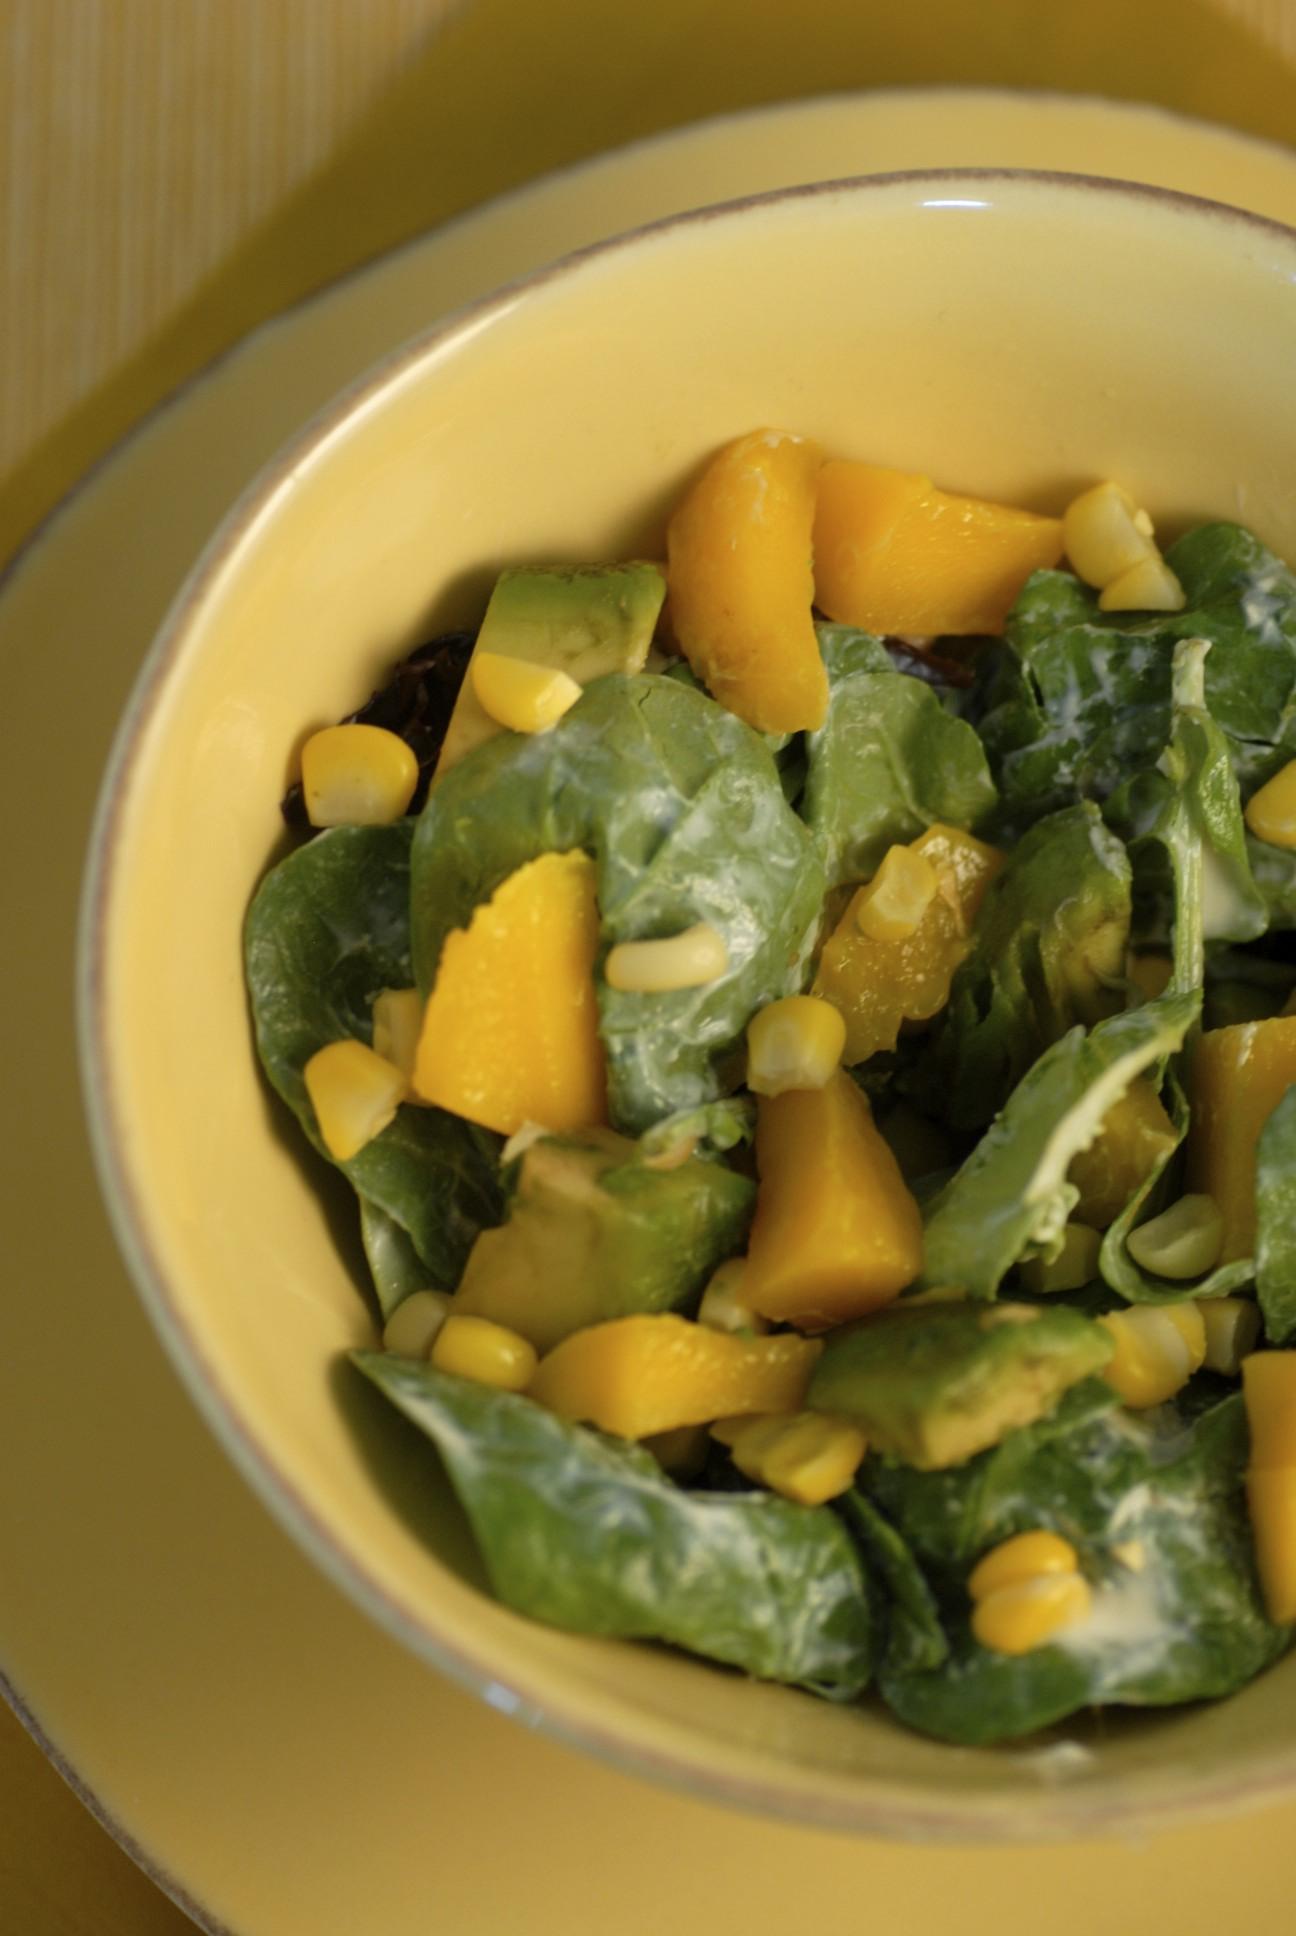 Roasted corn, avocado, and mango salad with creamy ginger dressing (silken tofu-based)